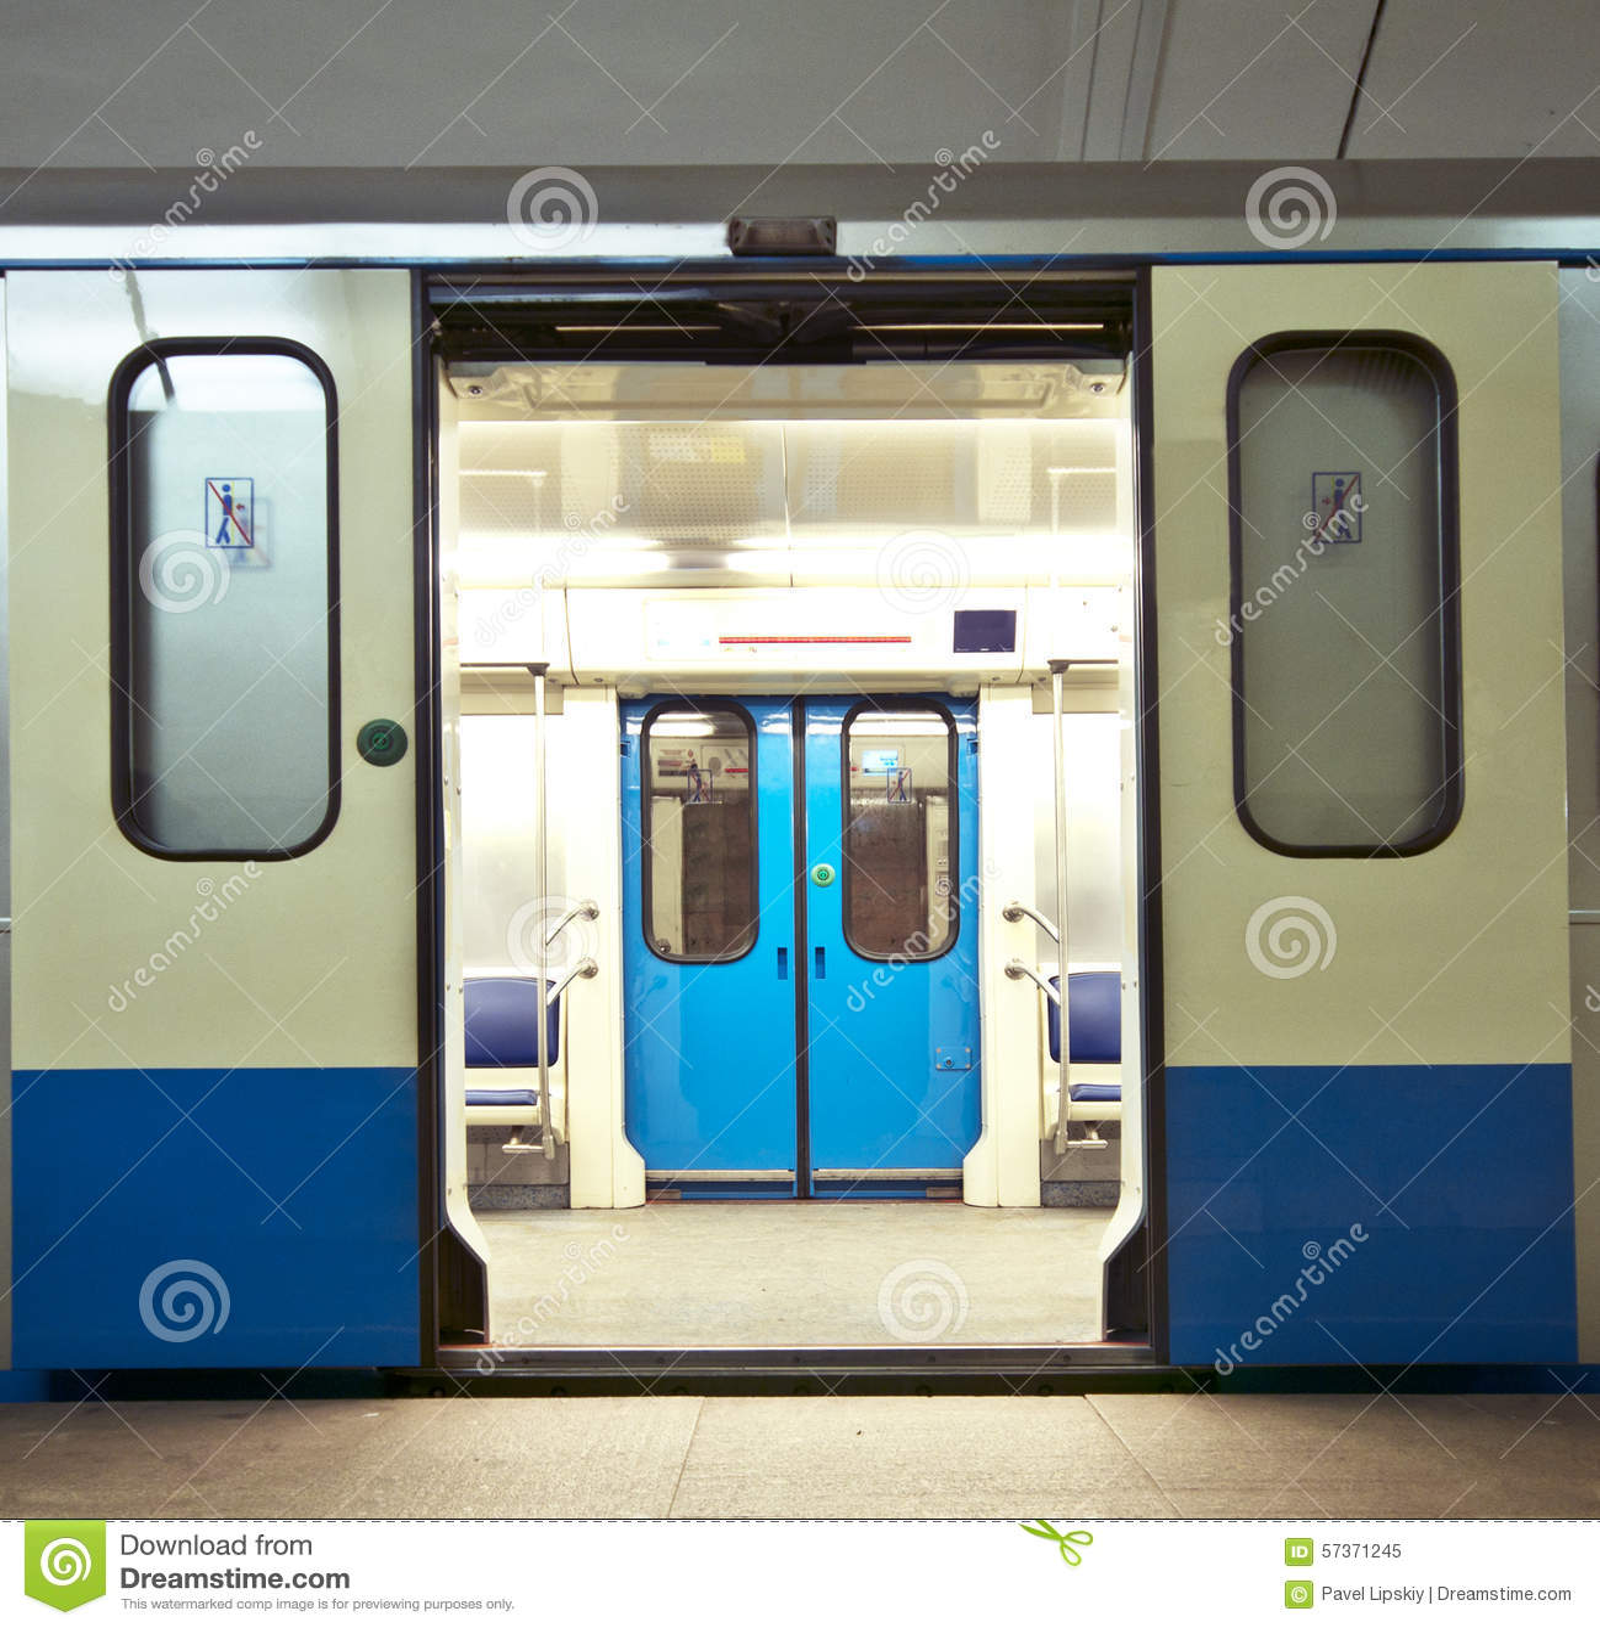 Royalty-Free Stock Photo & Subway train stock image. Image of doors subway hall - 57371245